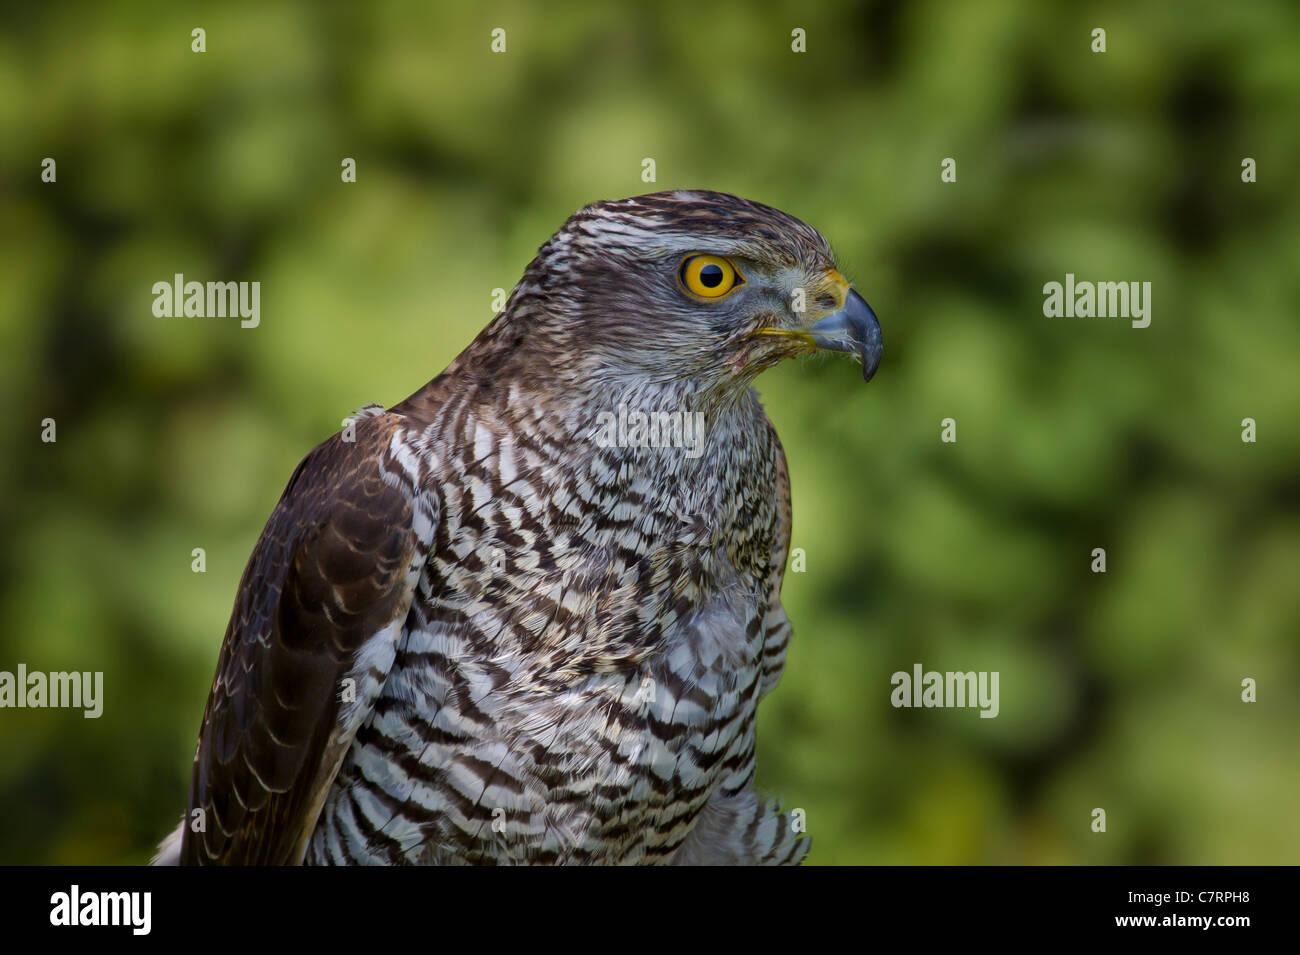 Accipiter gentilis GREIFVOGEL Habicht Northern Goshawk accipitridae auge aves bird of prey falconiformes greife - Stock Image